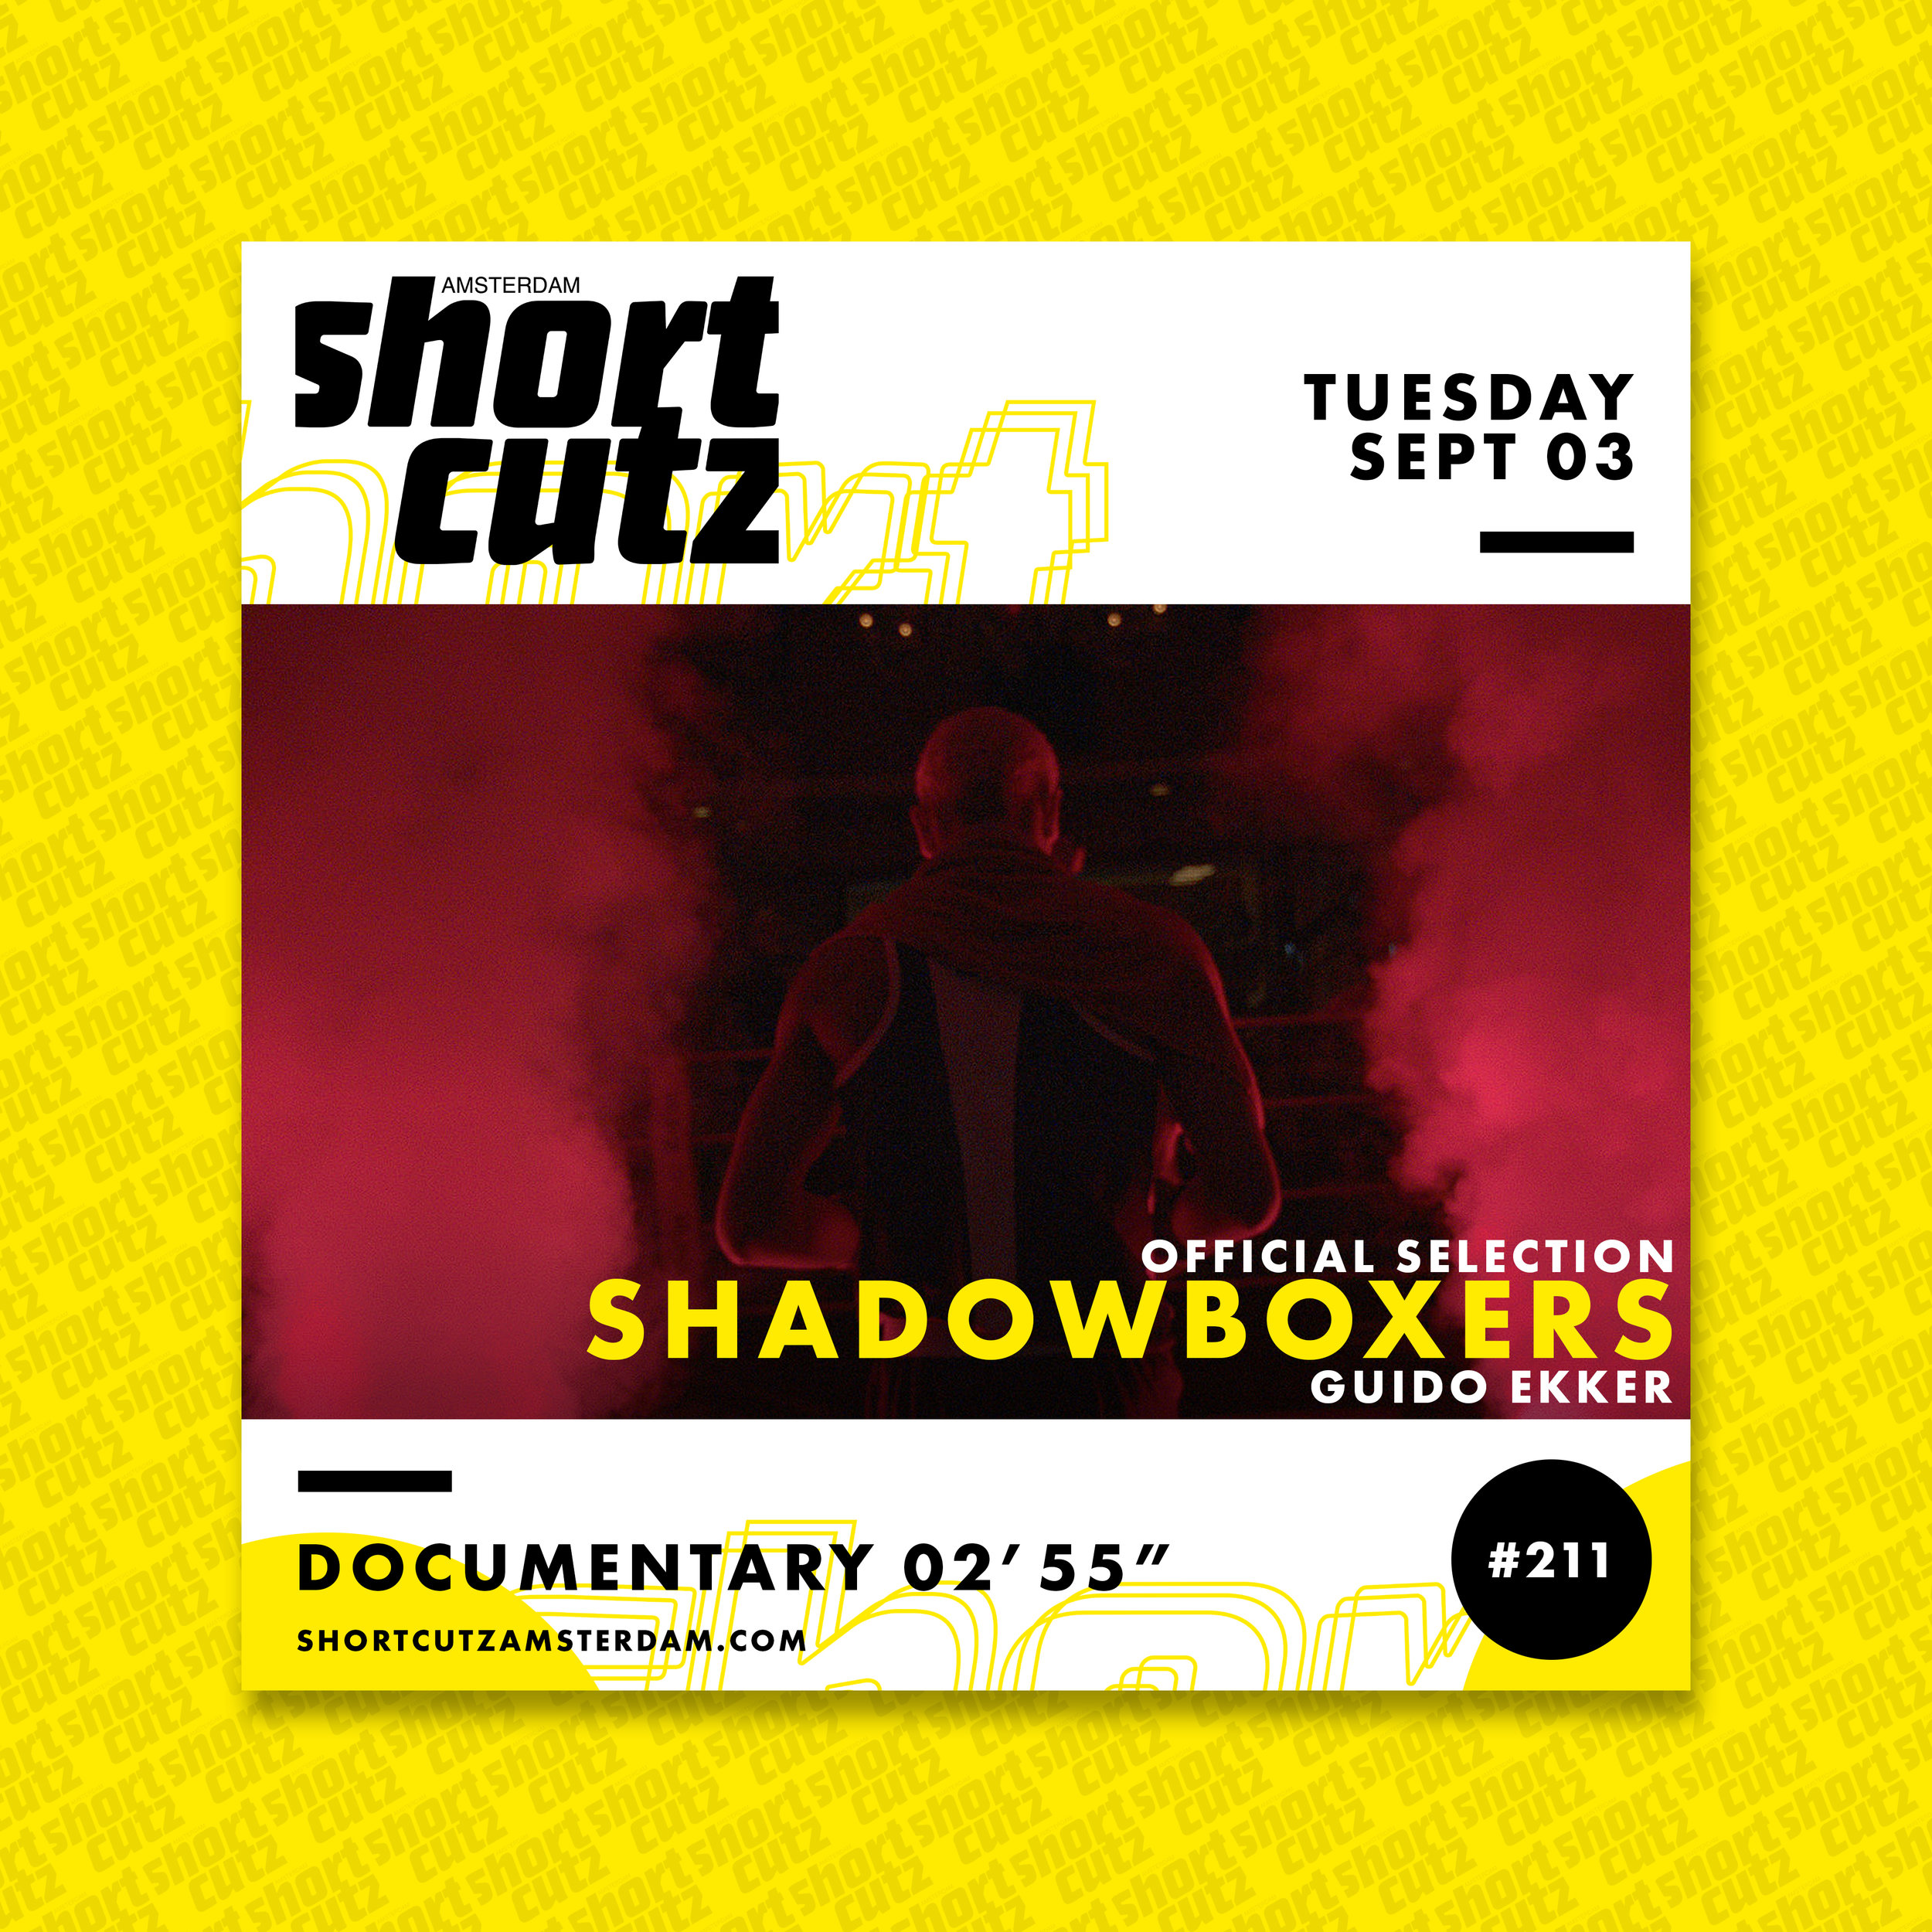 #211 Poster Shadowboxers.jpg